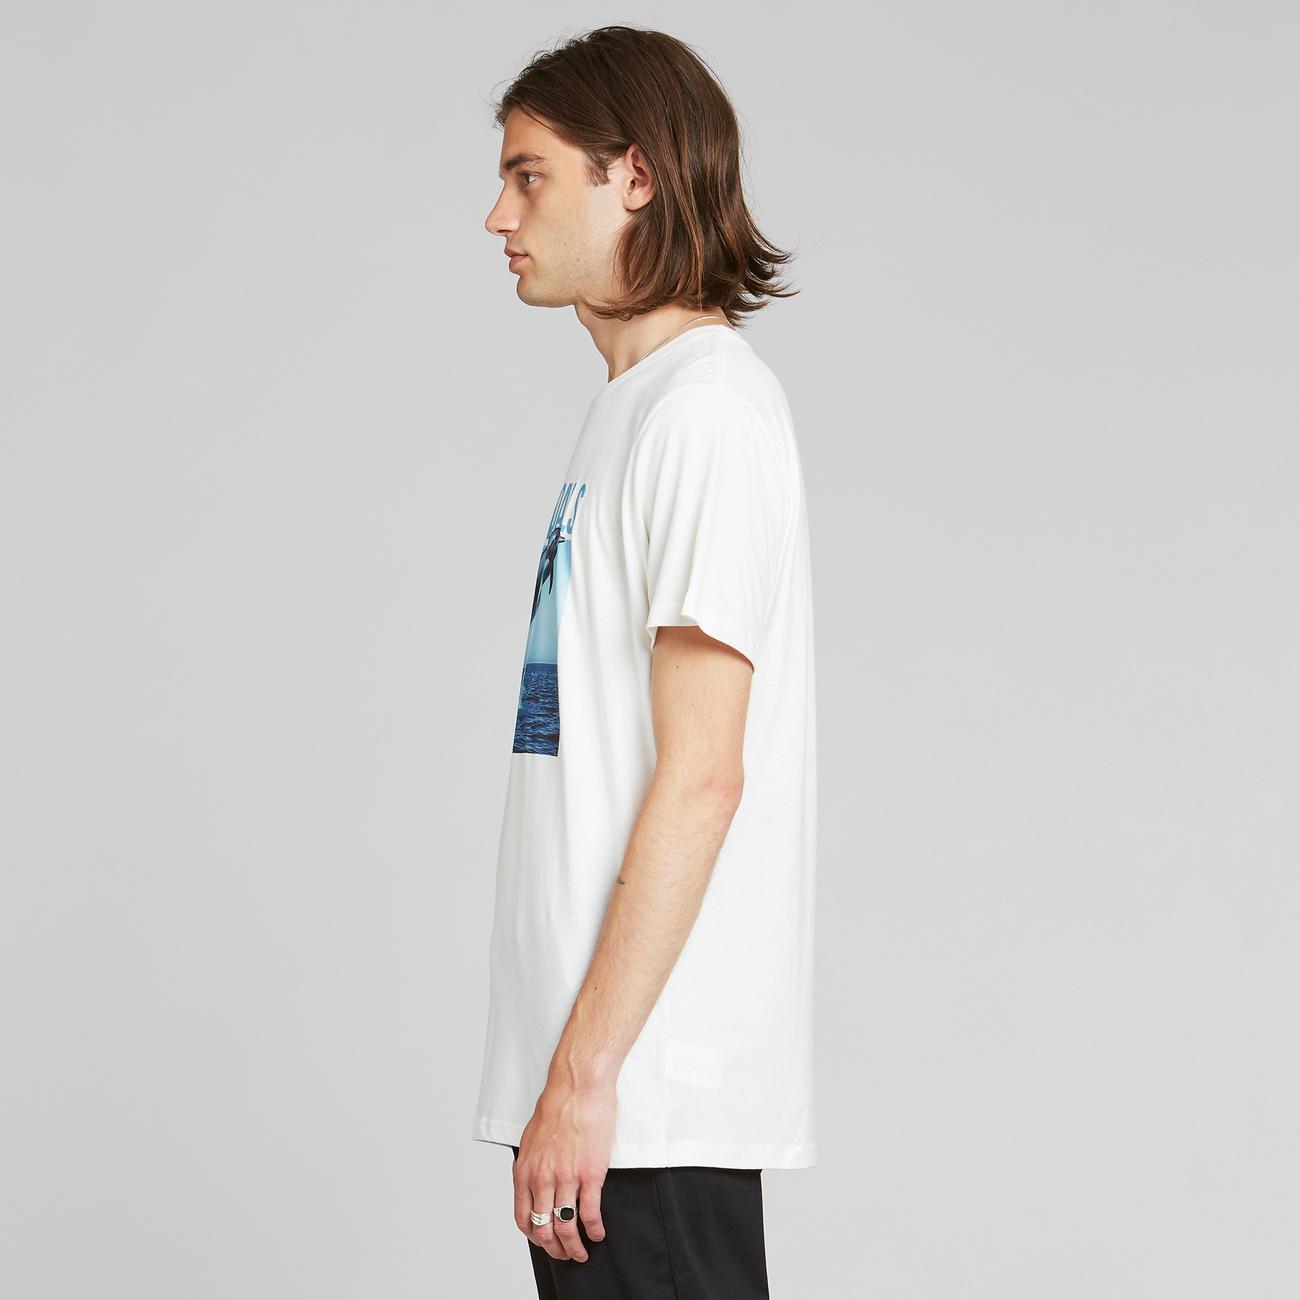 T-shirt Stockholm Squad Goals Off-White